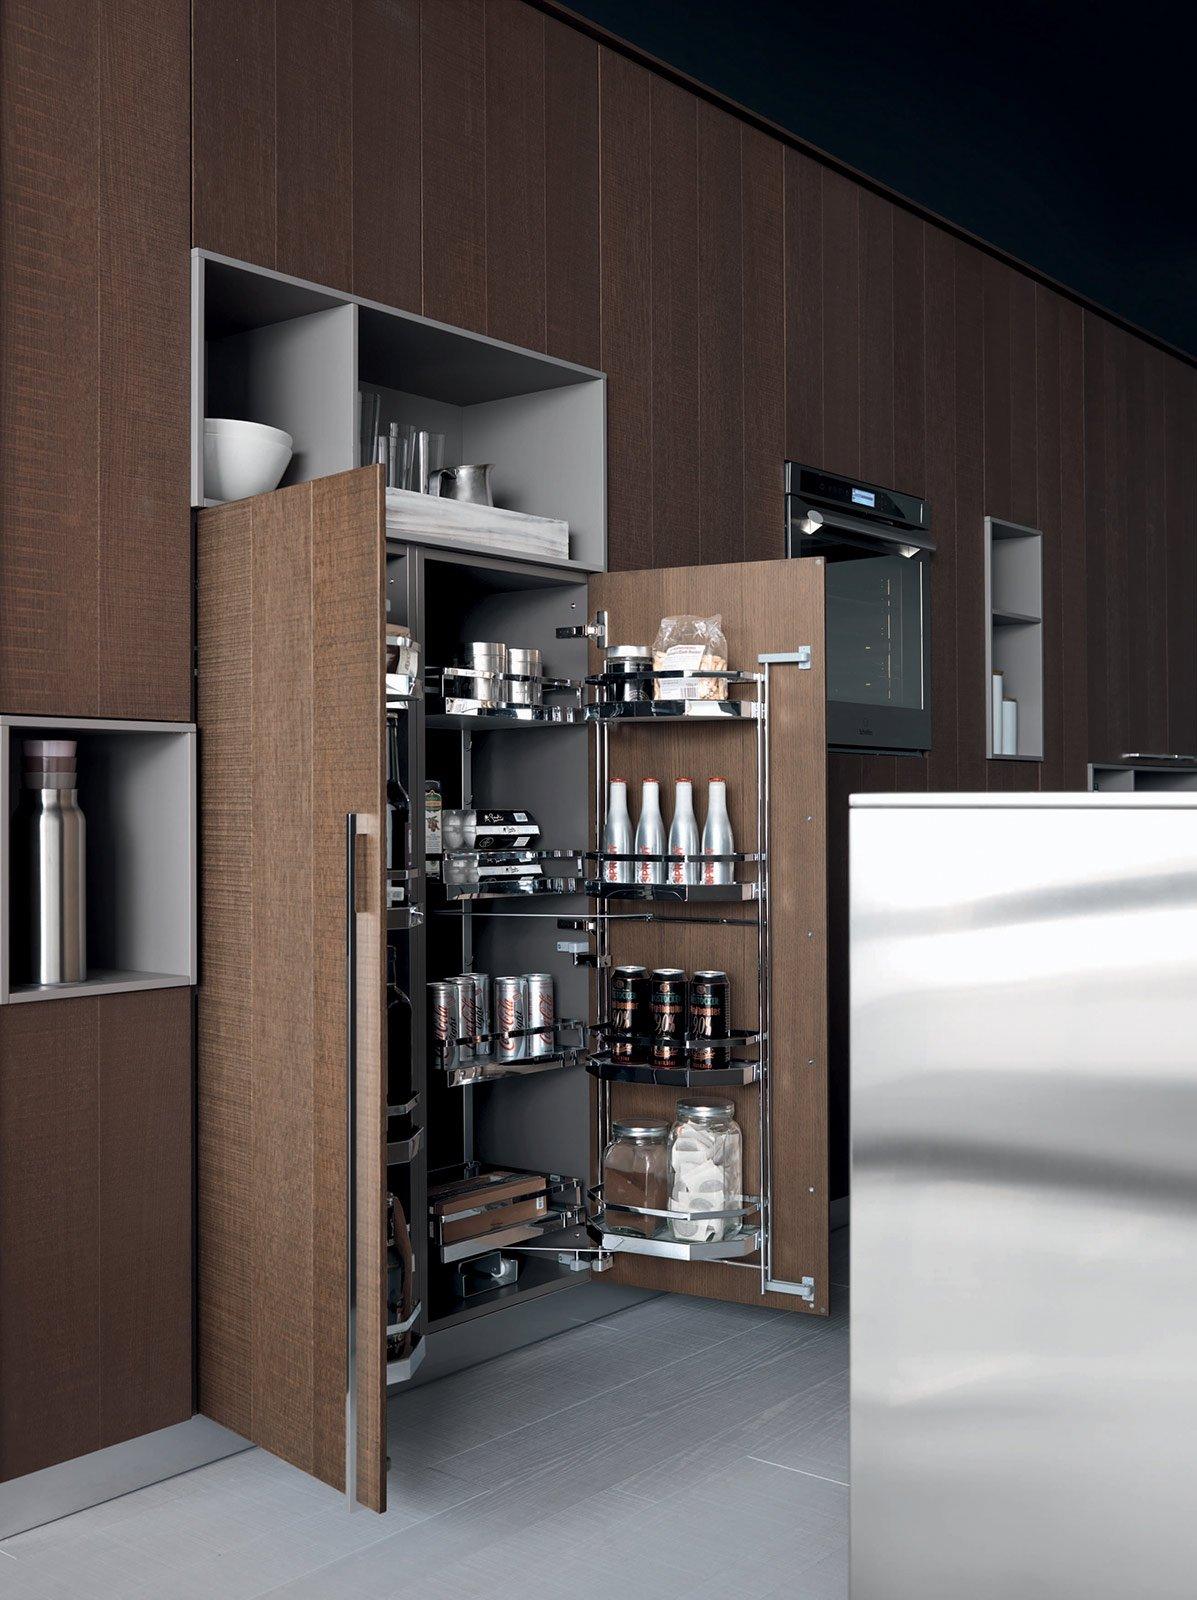 Cucina che moduli scelgo per la dispensa cose di casa - Dispense per cucina ...